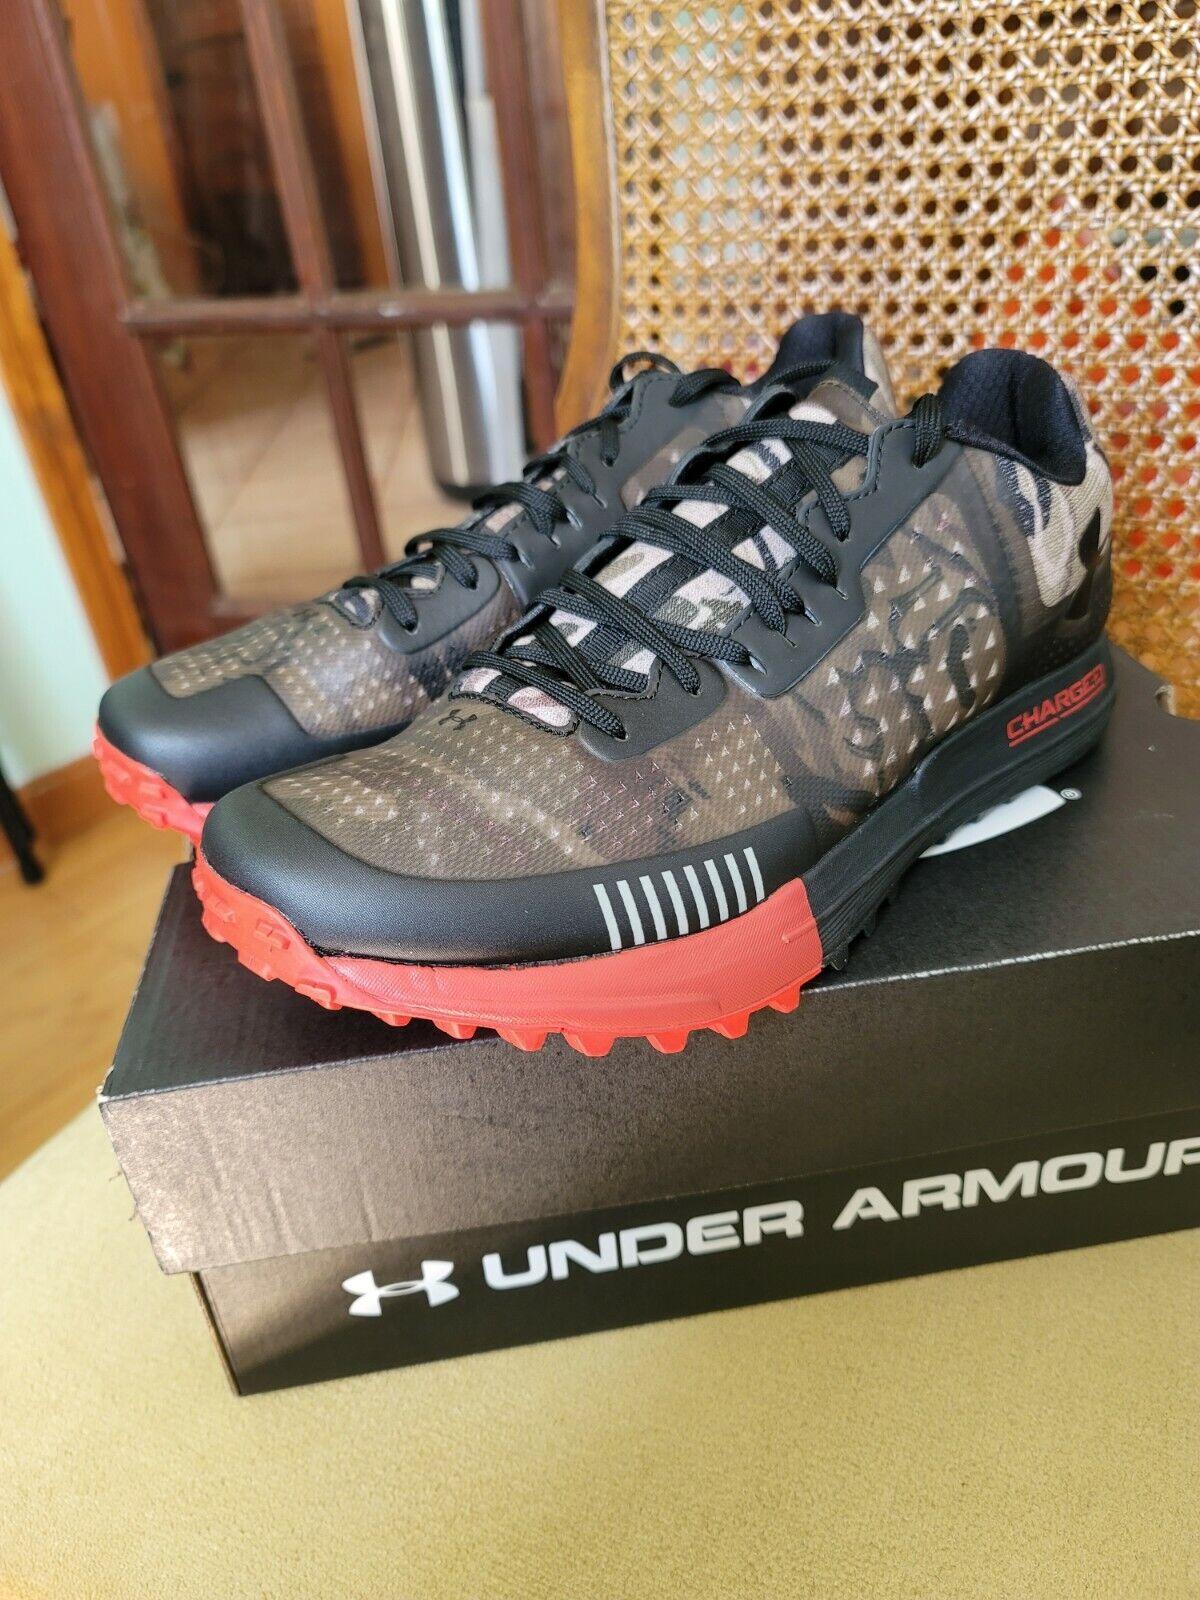 tubo bala Jane Austen  Under Armour Horizon Rtt Trail Running Shoes Mens 10 Camo Black Red  1287337-900 for sale online | eBay